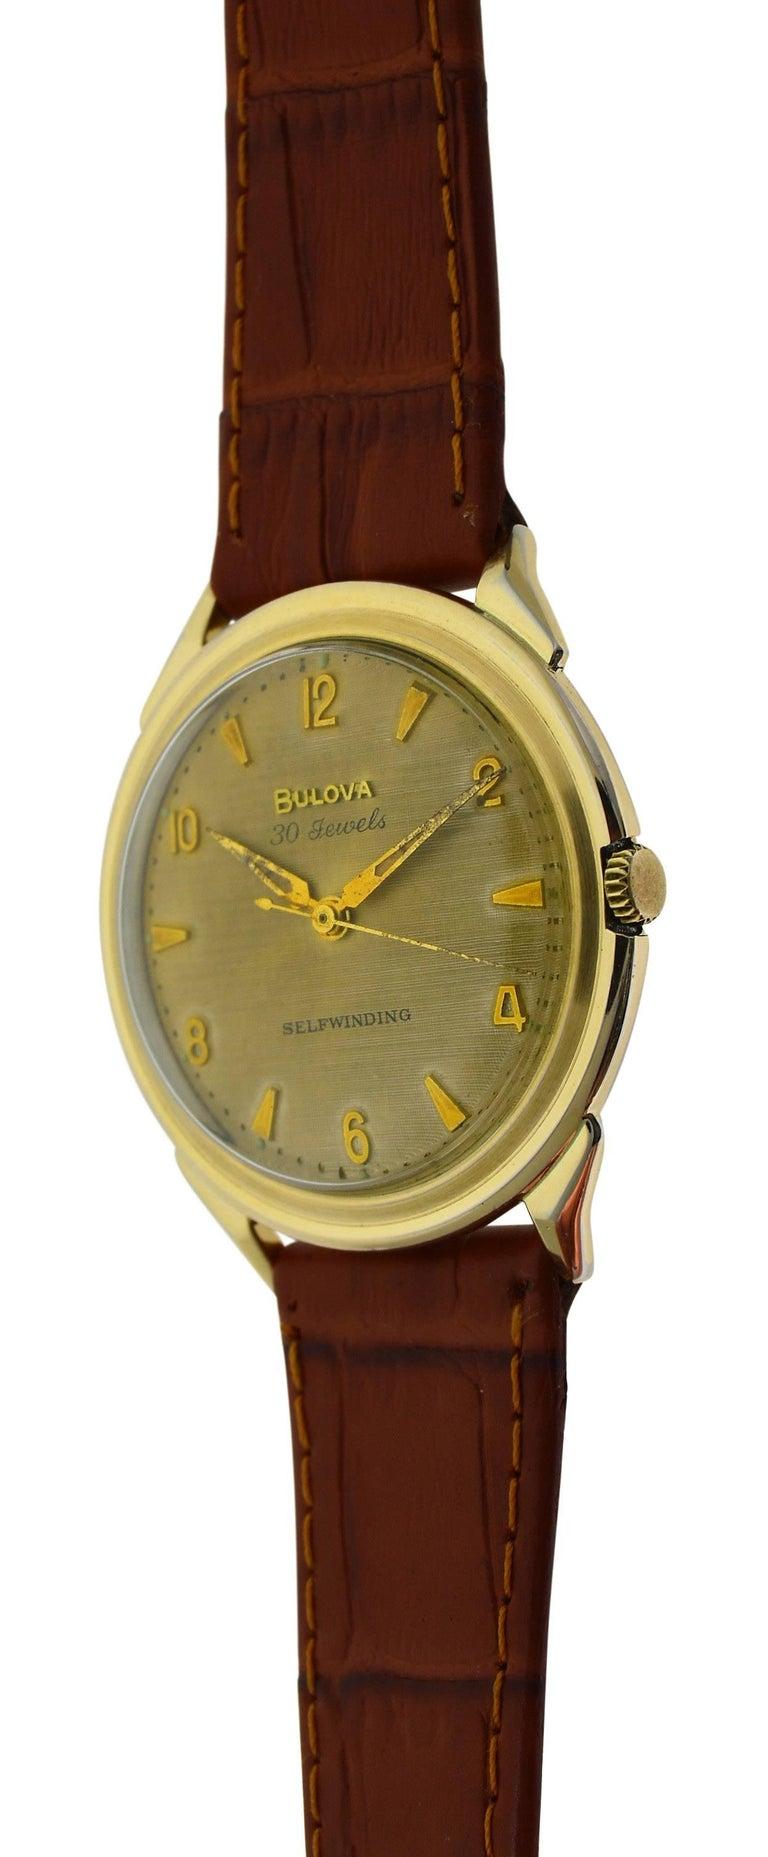 Bulova Yellow Gold Filled Art Deco Original Dial Self winding Wristwatch, 1960s For Sale 1